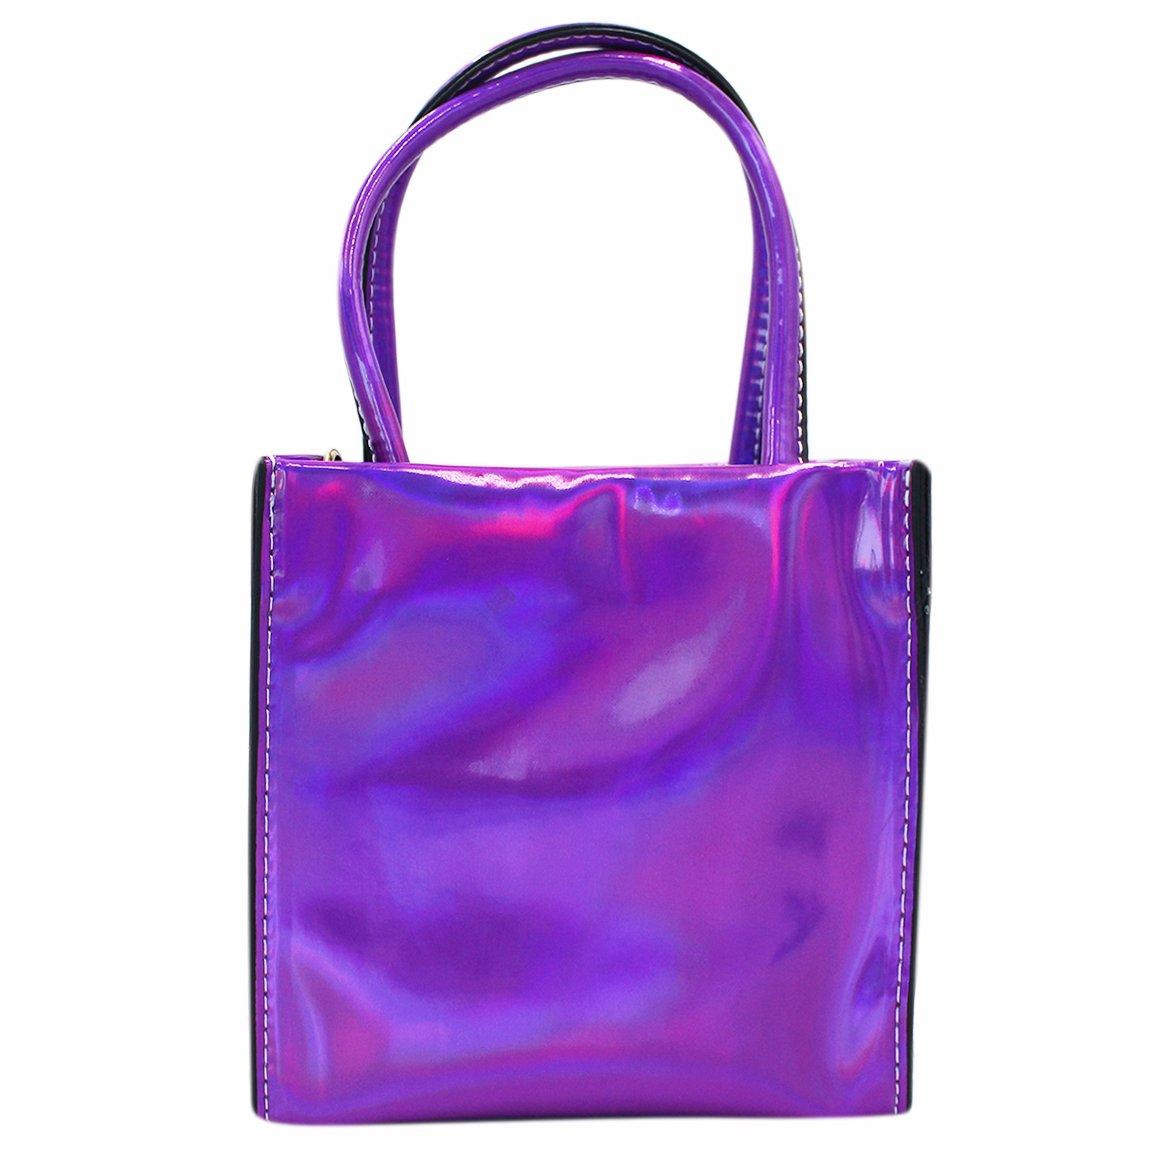 Women Girls Holographic Crossbody Shoulder Bag Small Fashion Tote Handbag Satchel